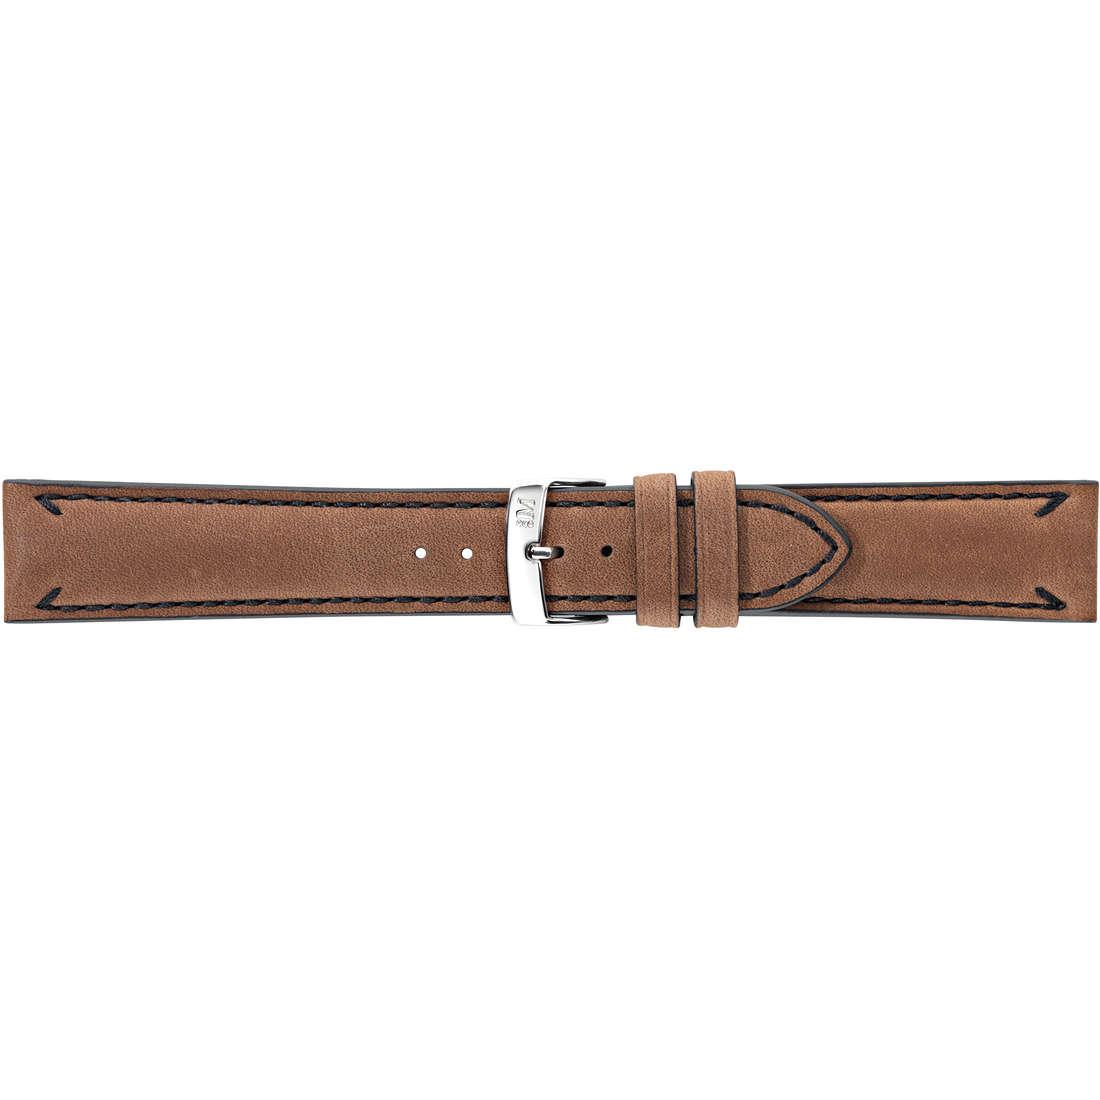 watch watch bands watch straps man Morellato Manufatti A01X4540A61034CR22